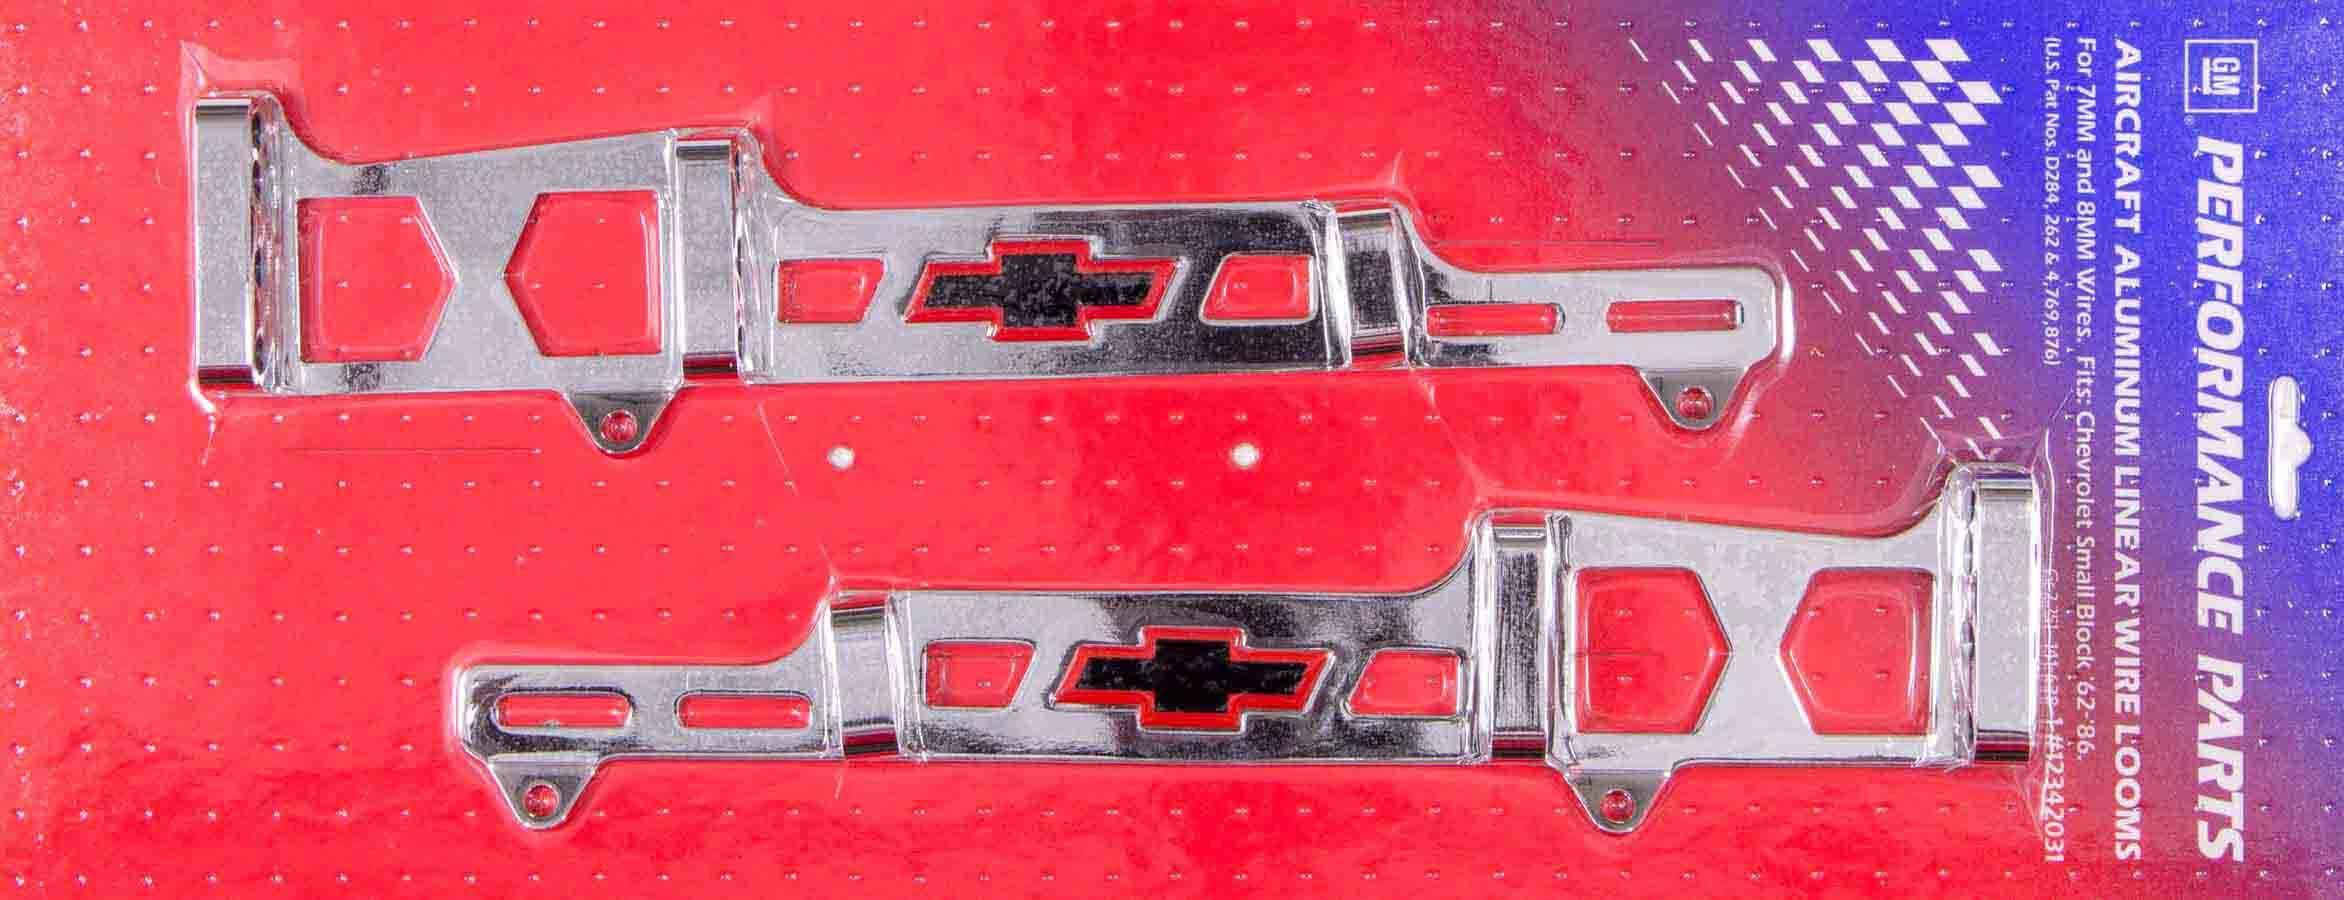 Proform 141-638 Spark Plug Wire Loom, Valve Cover Mount, 7-8 mm, Bowtie Logo, Aluminum, Chrome, Small Block Chevy, Kit